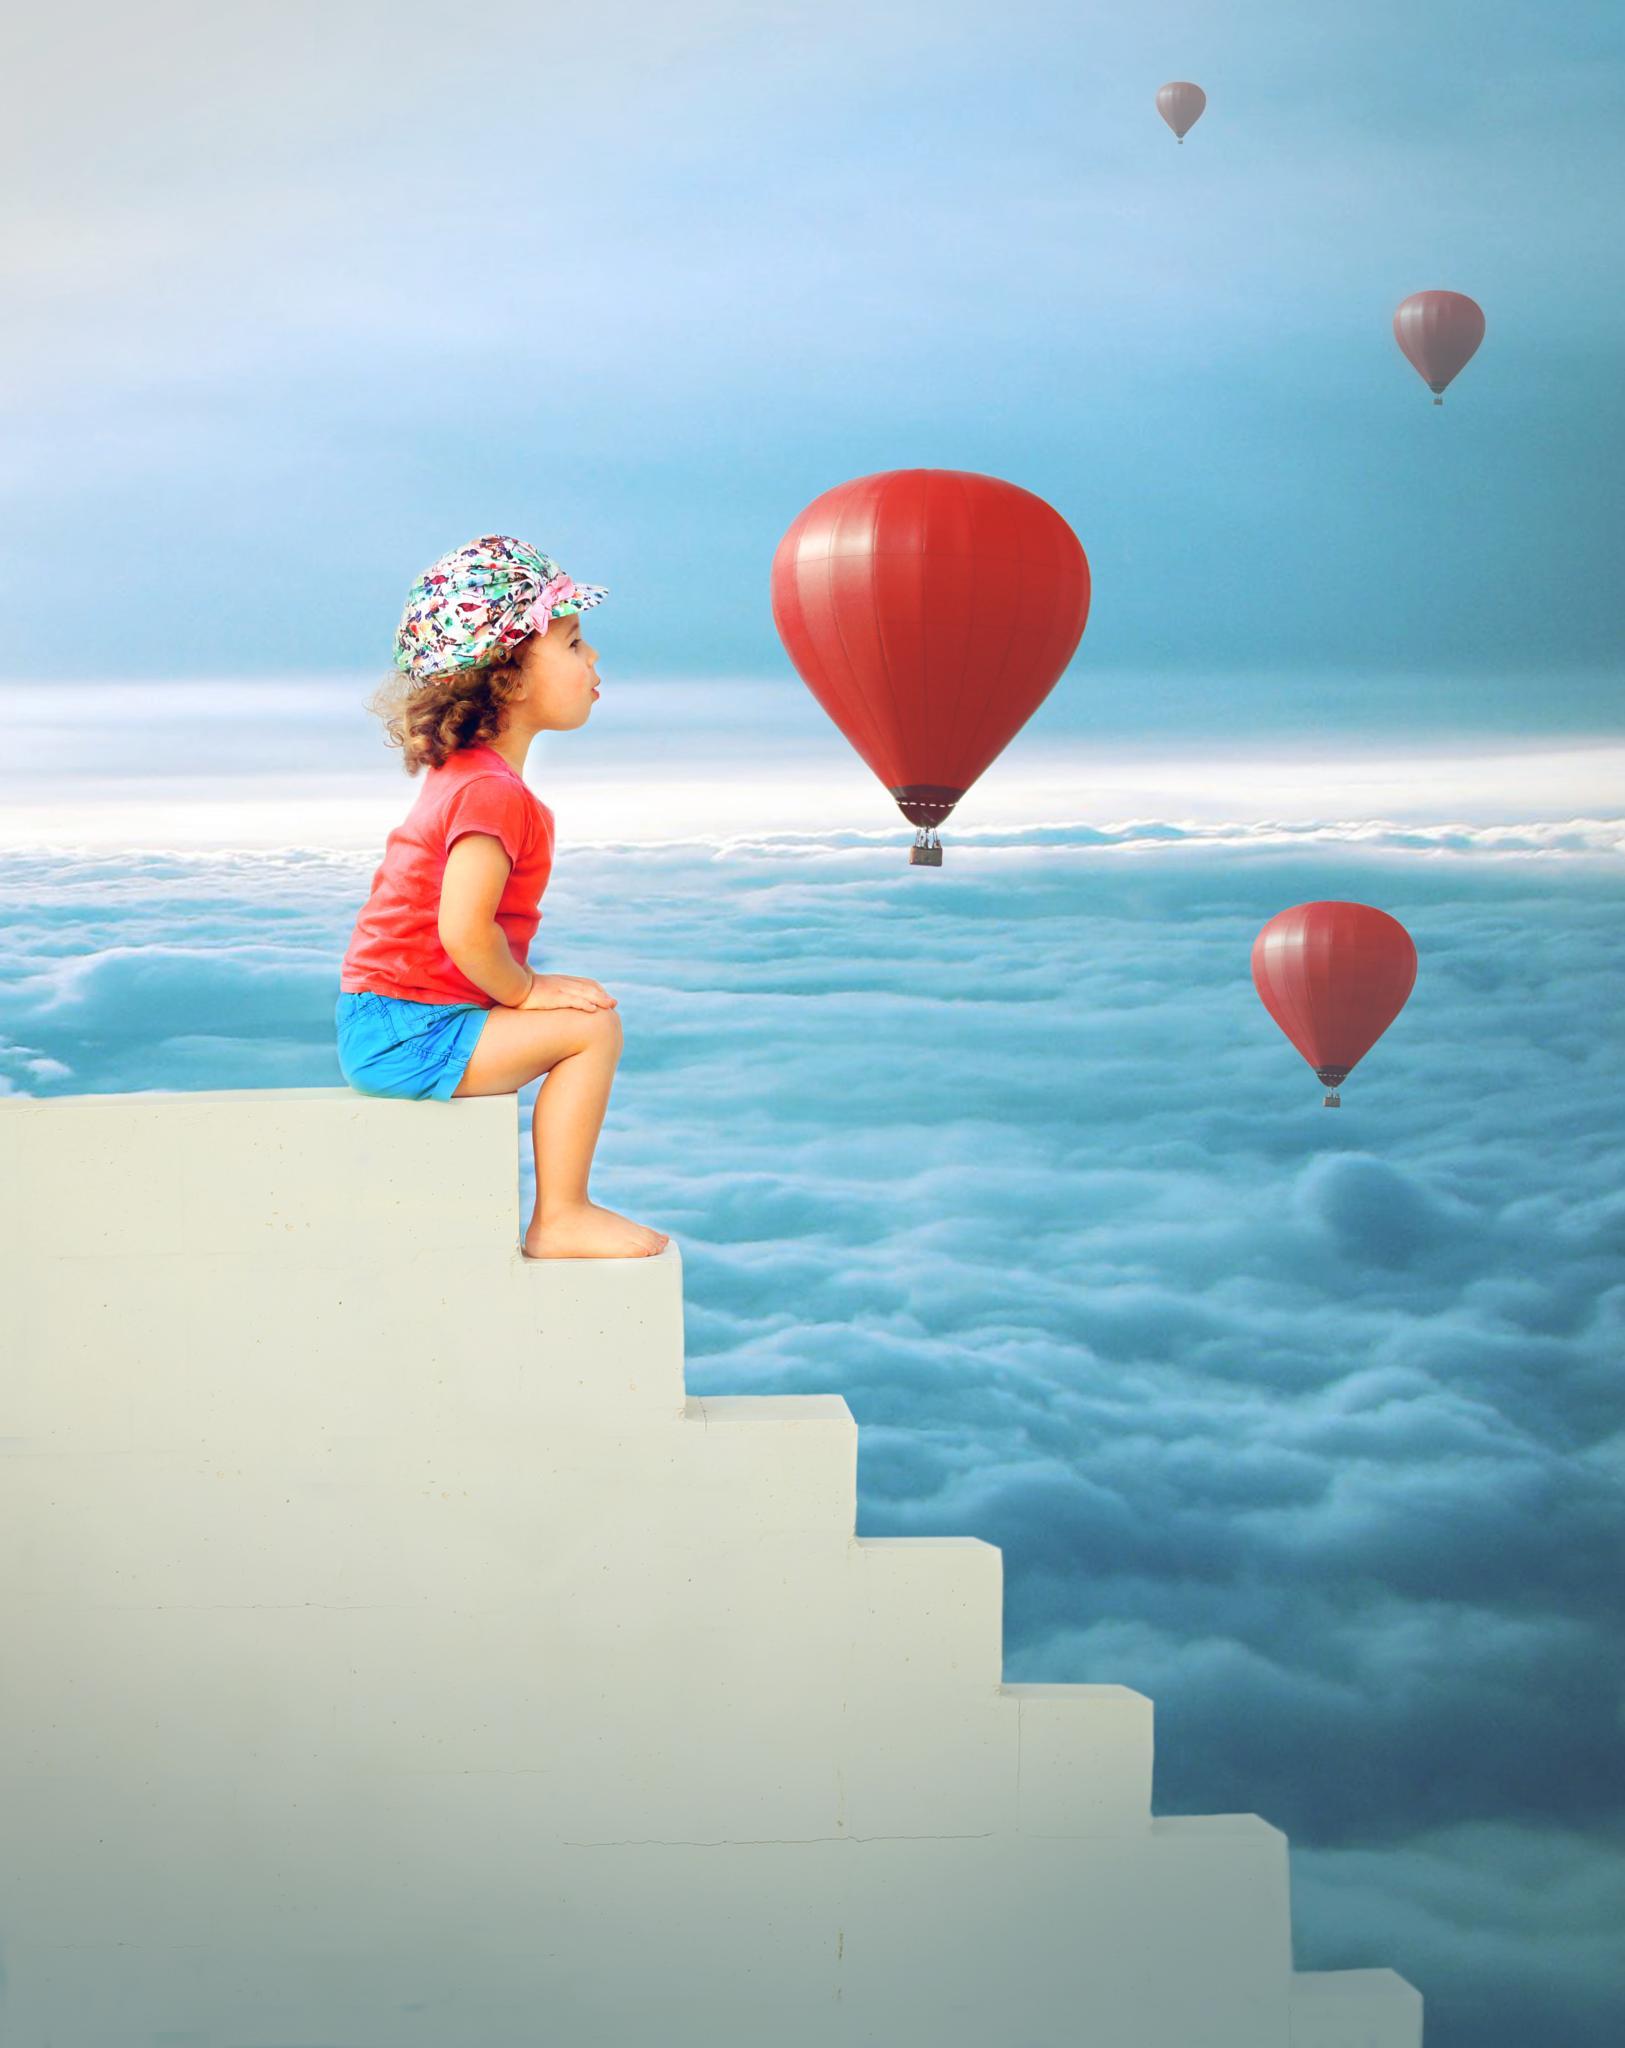 The Girl With Balloons by Jon Jon